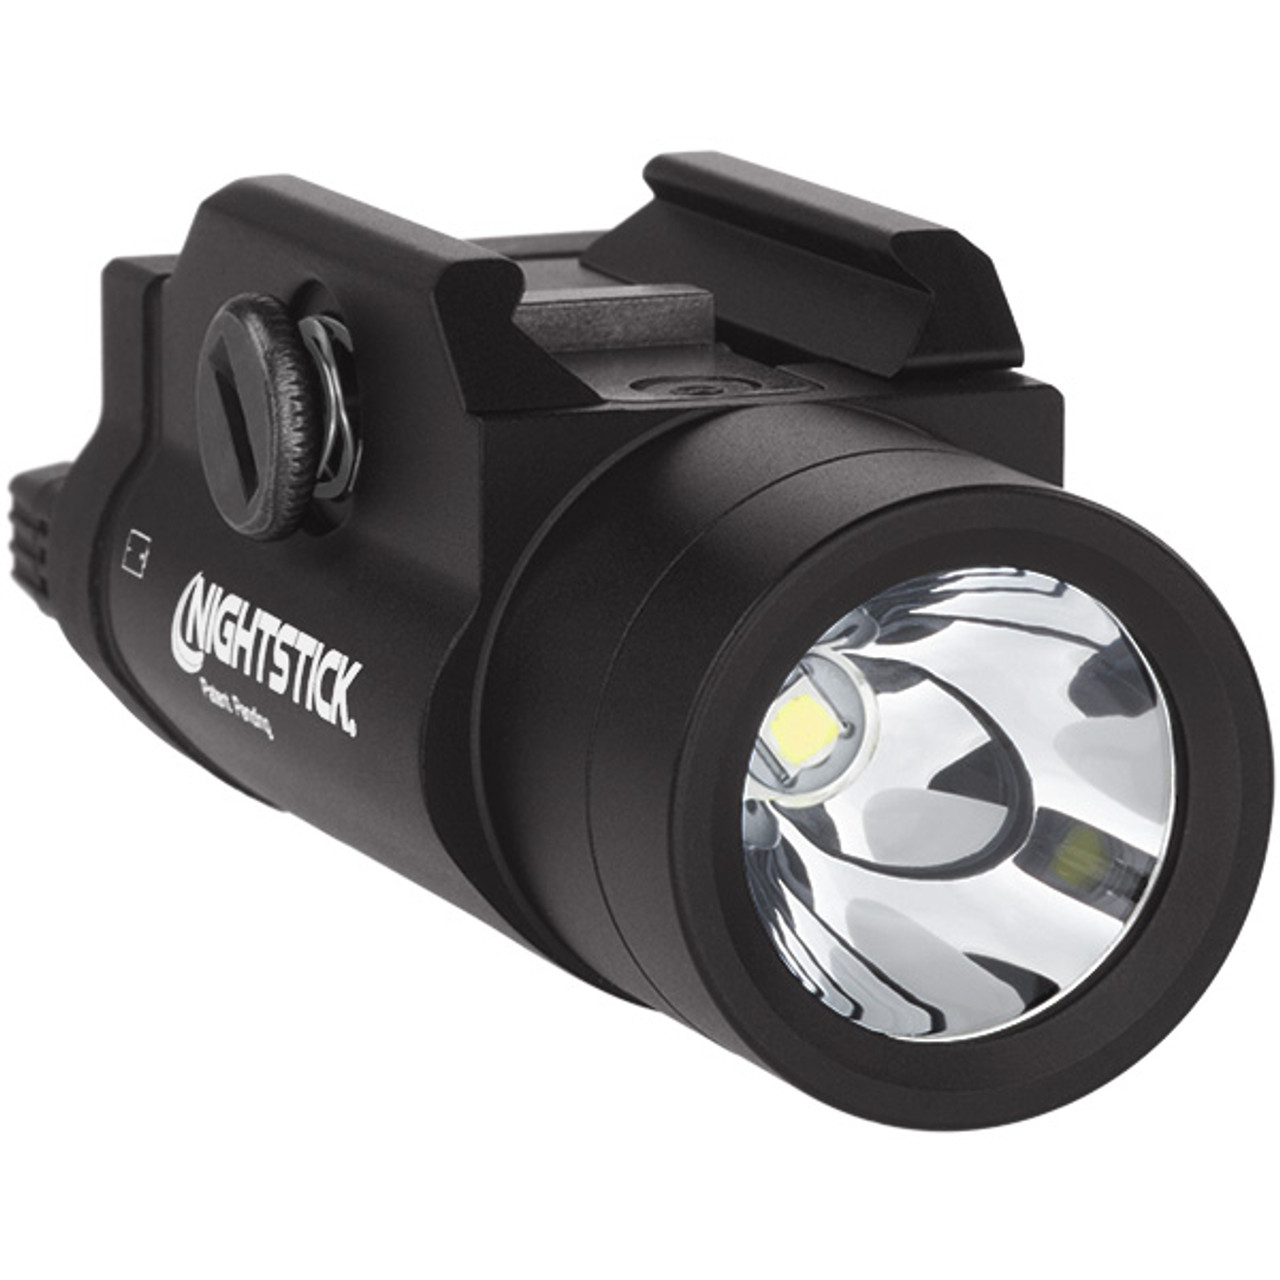 NightStick TWM-850XL Tactical Pistol Weapon Mounted Light 850 Lumen